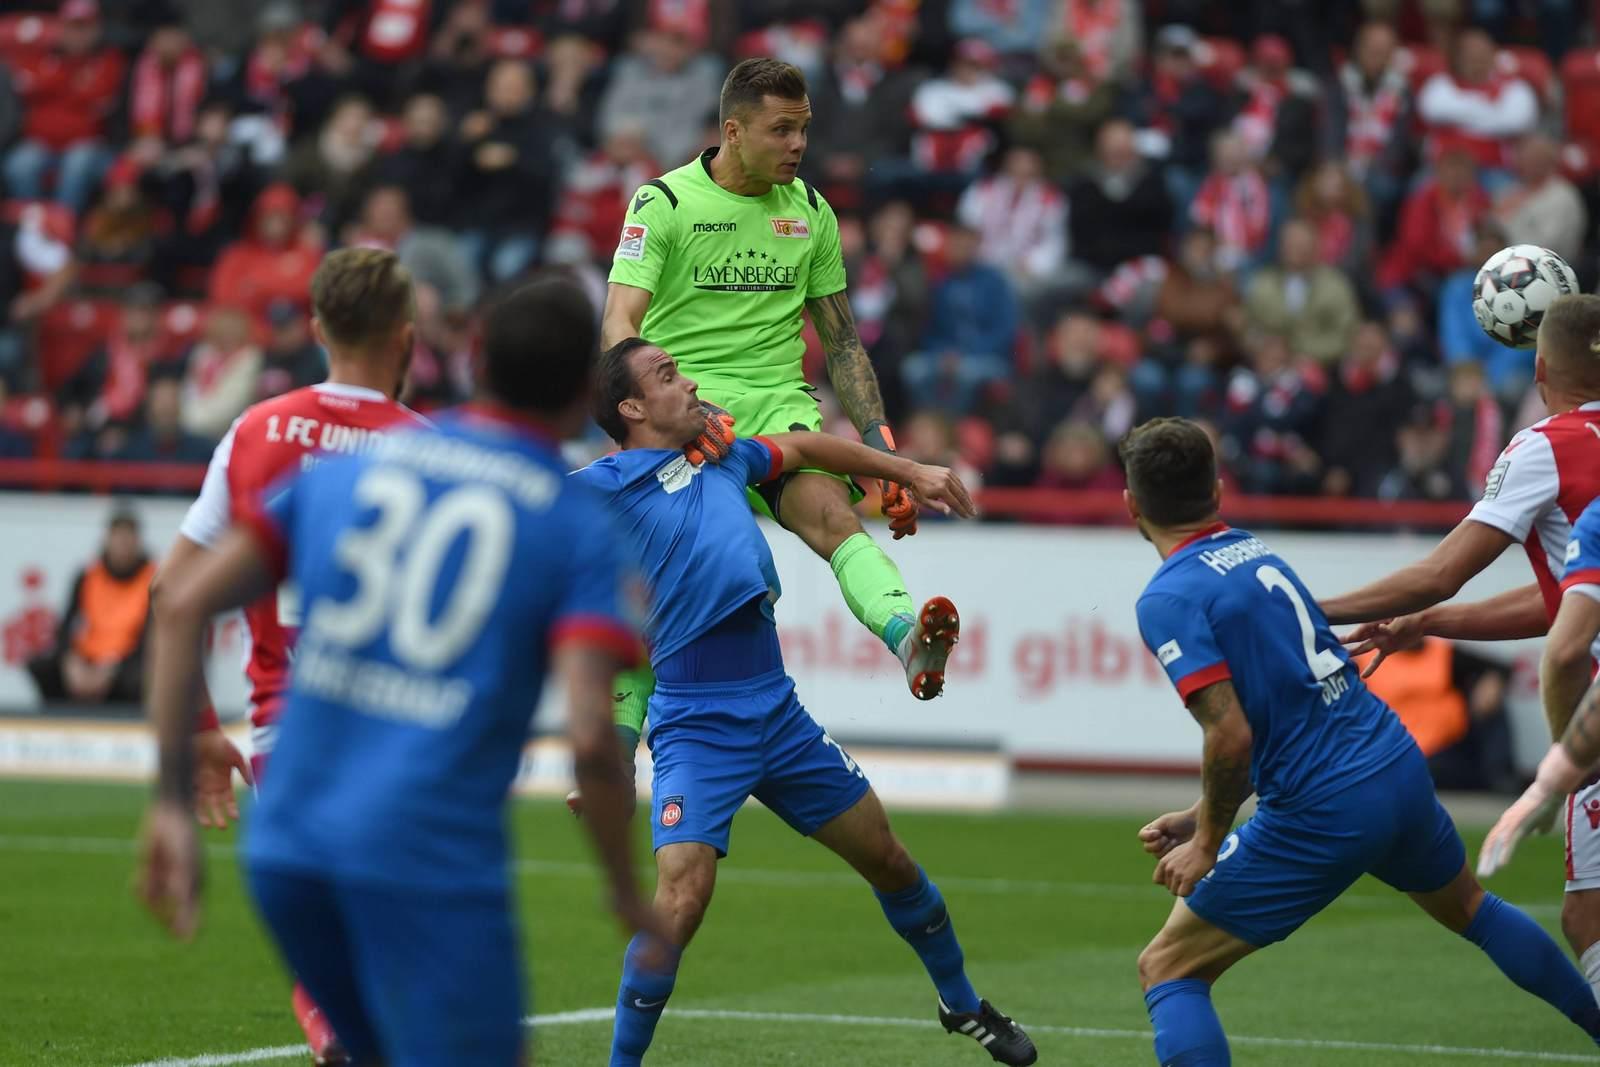 Rafal Gikiewicz gegen den 1. FC Heidenheim